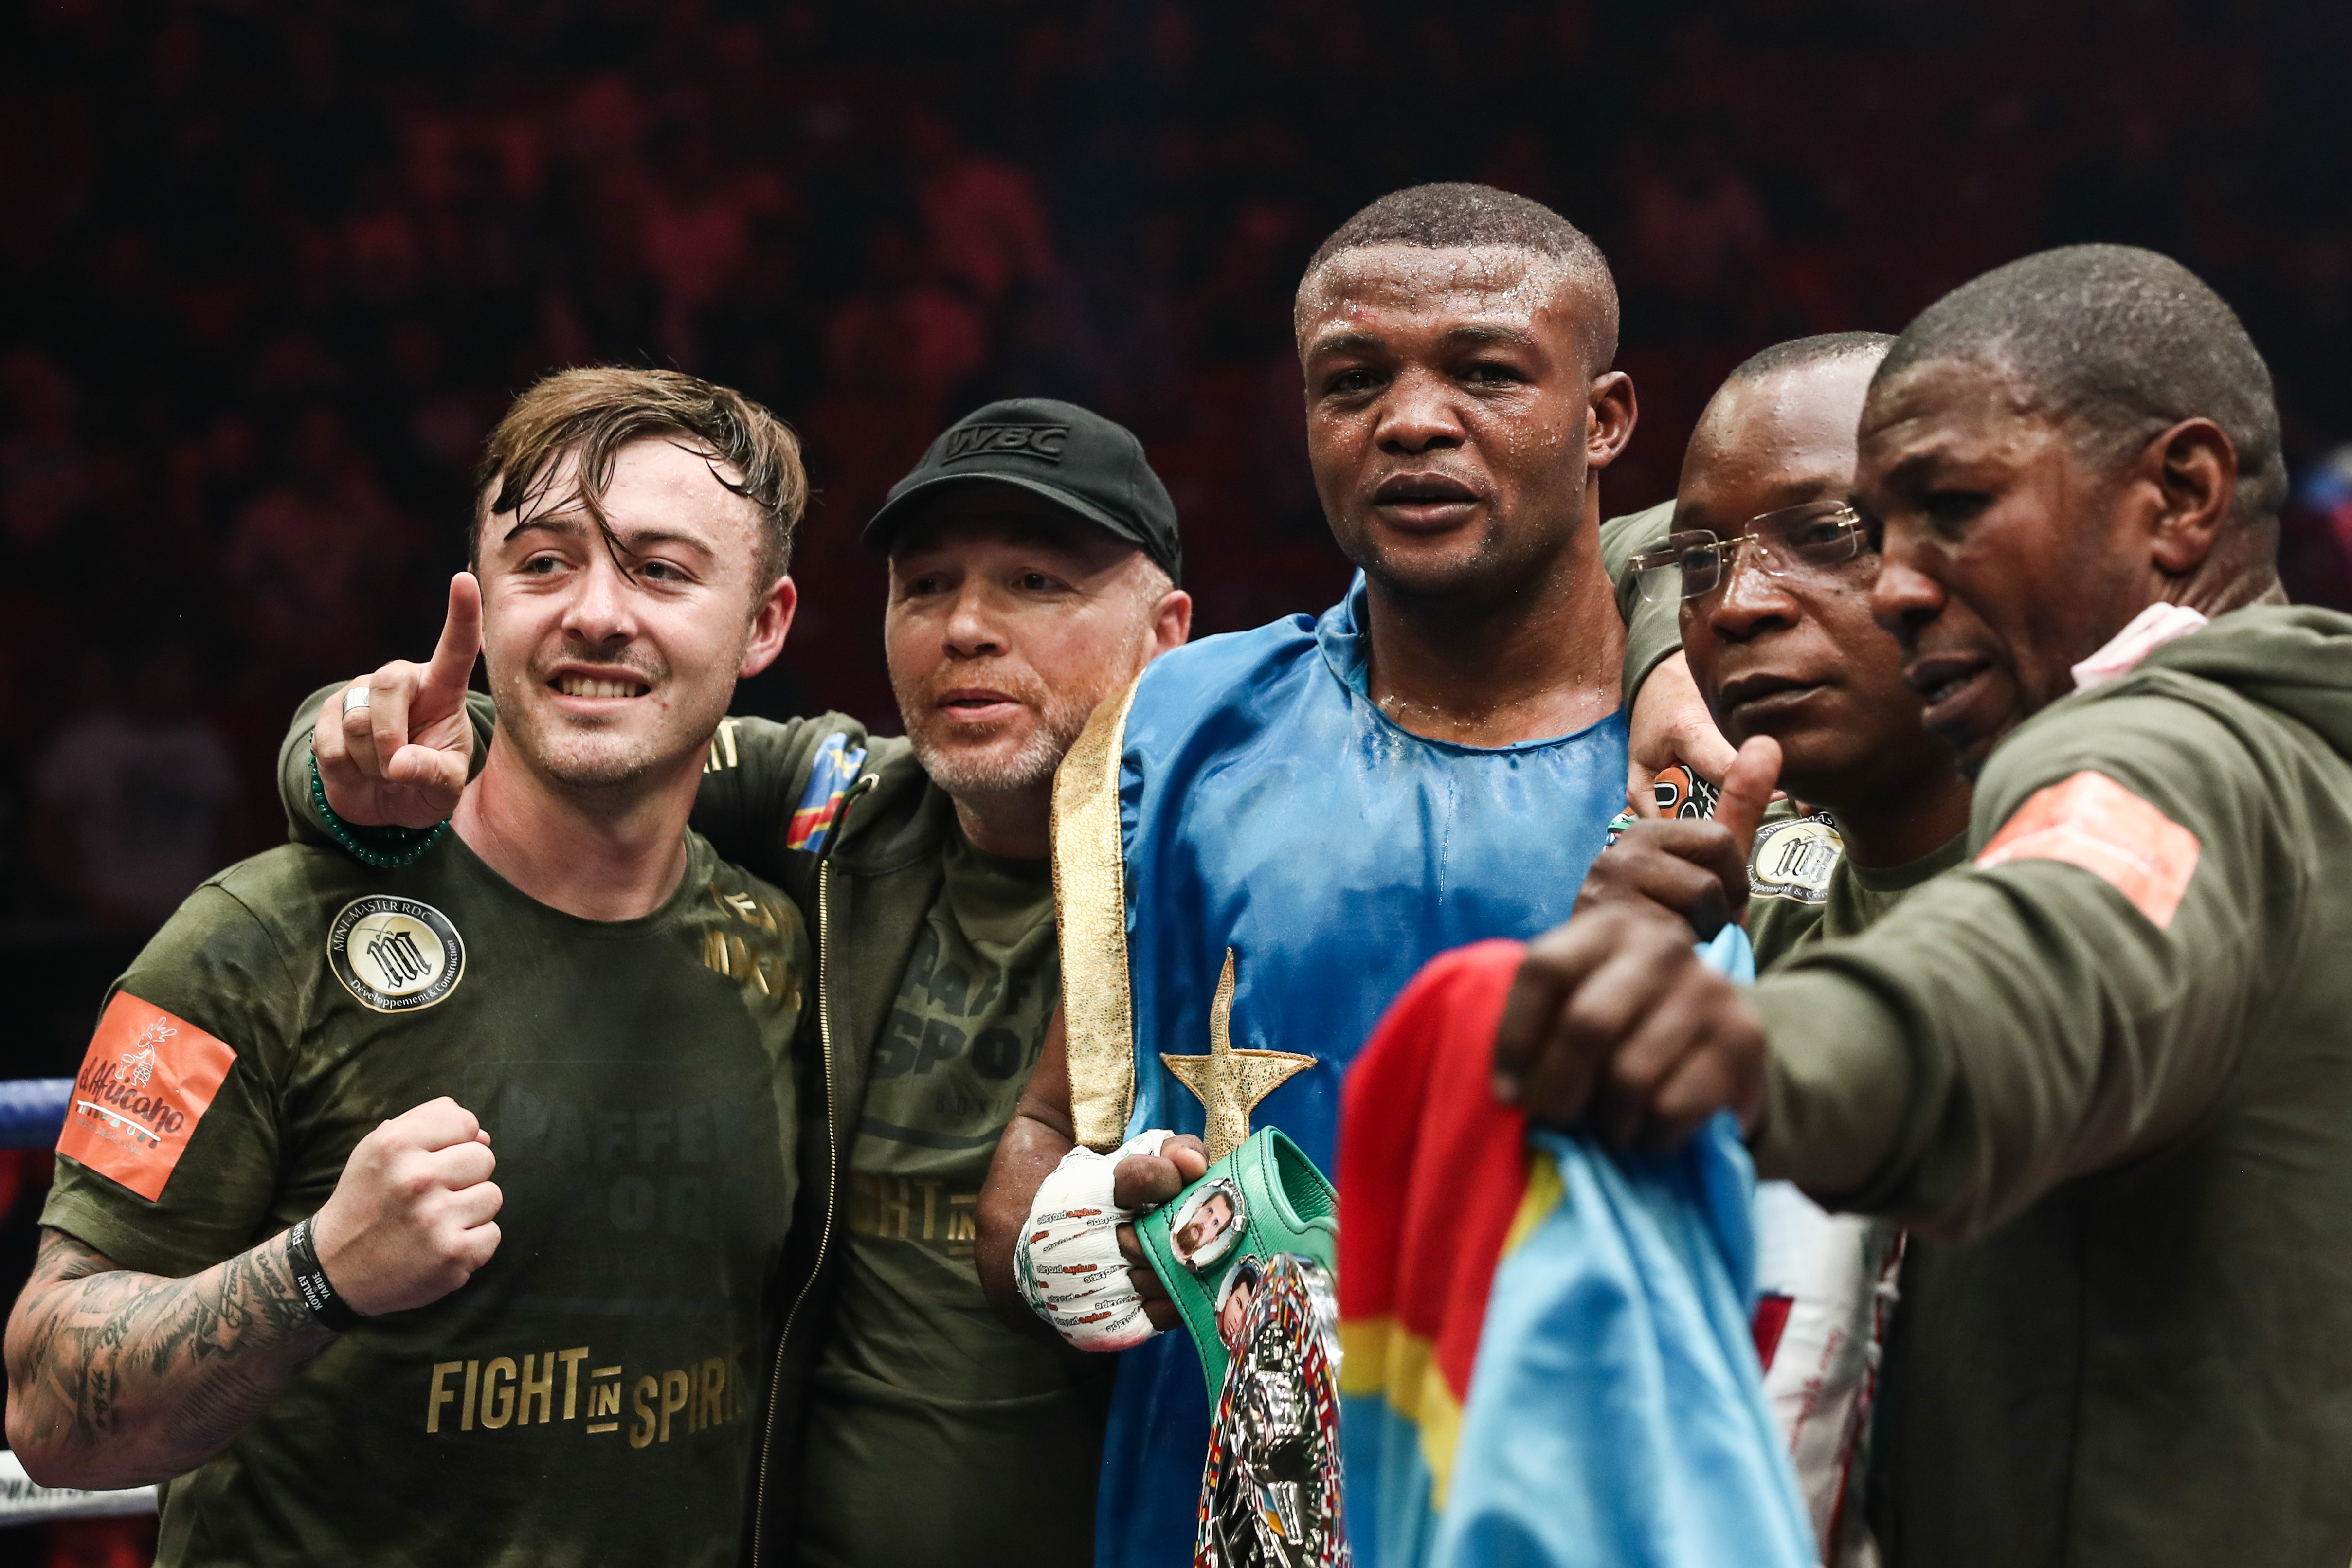 Boxing show in Chelyabinsk, Russia